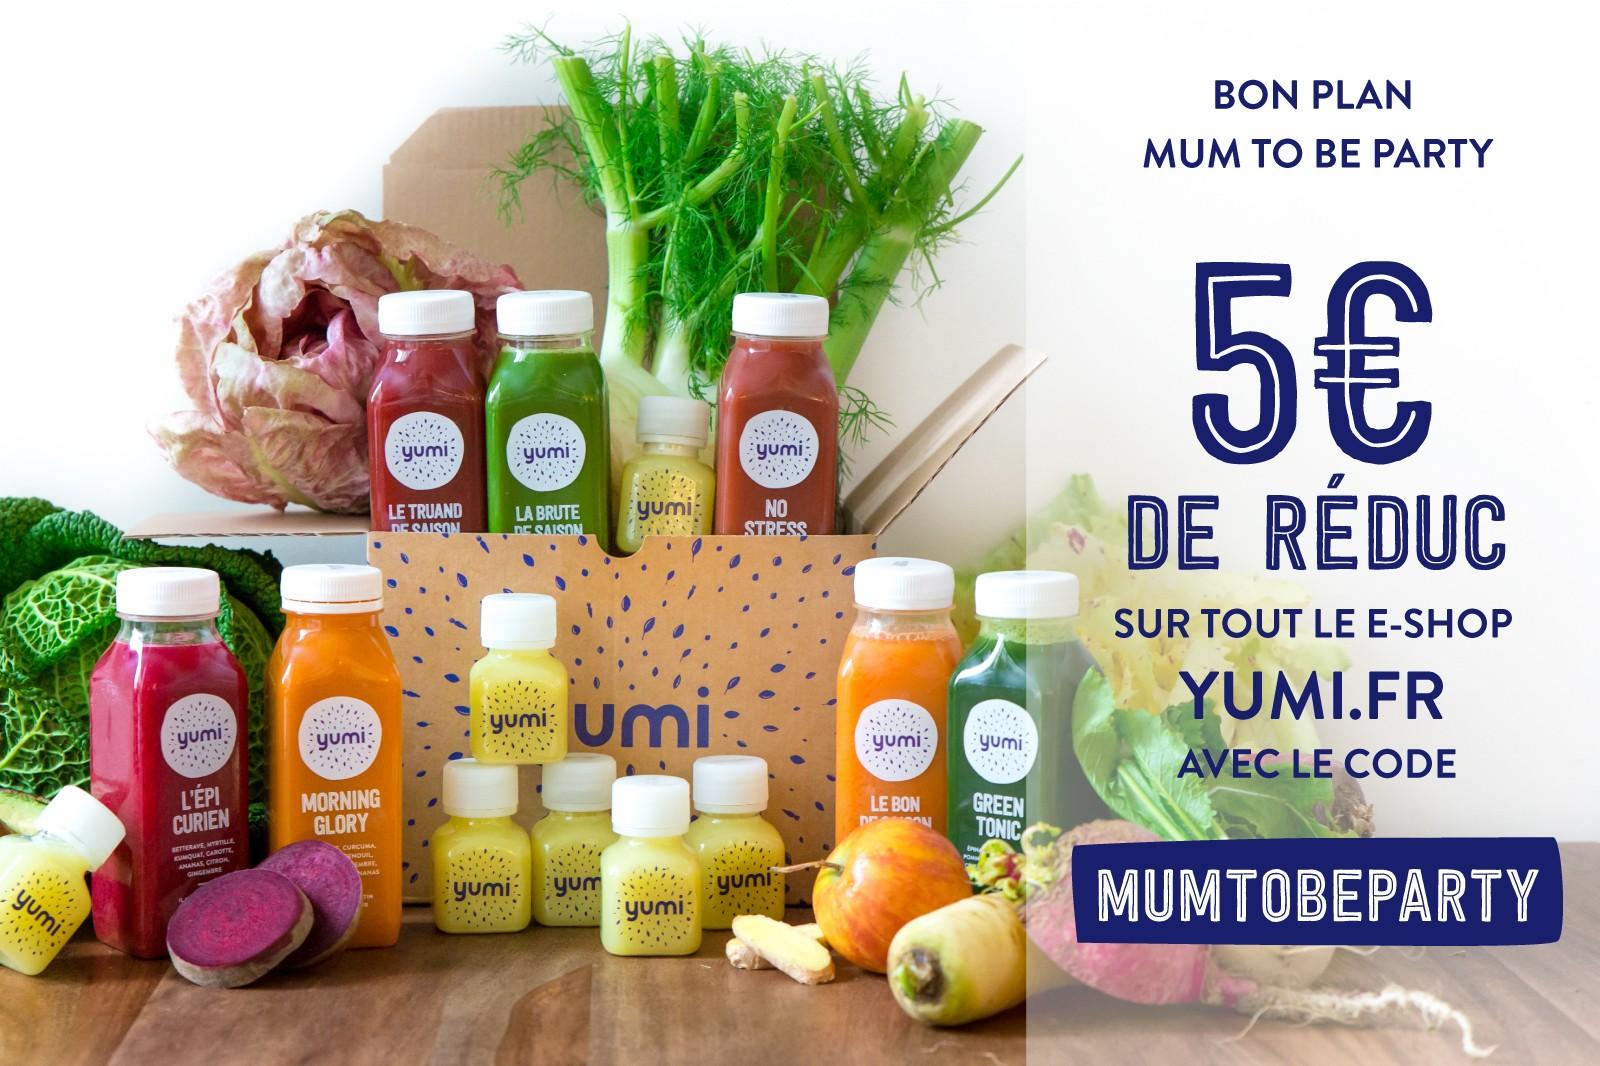 bon-plan-jus-YUMI-reduction-mumtobeparty-shot-gingembre